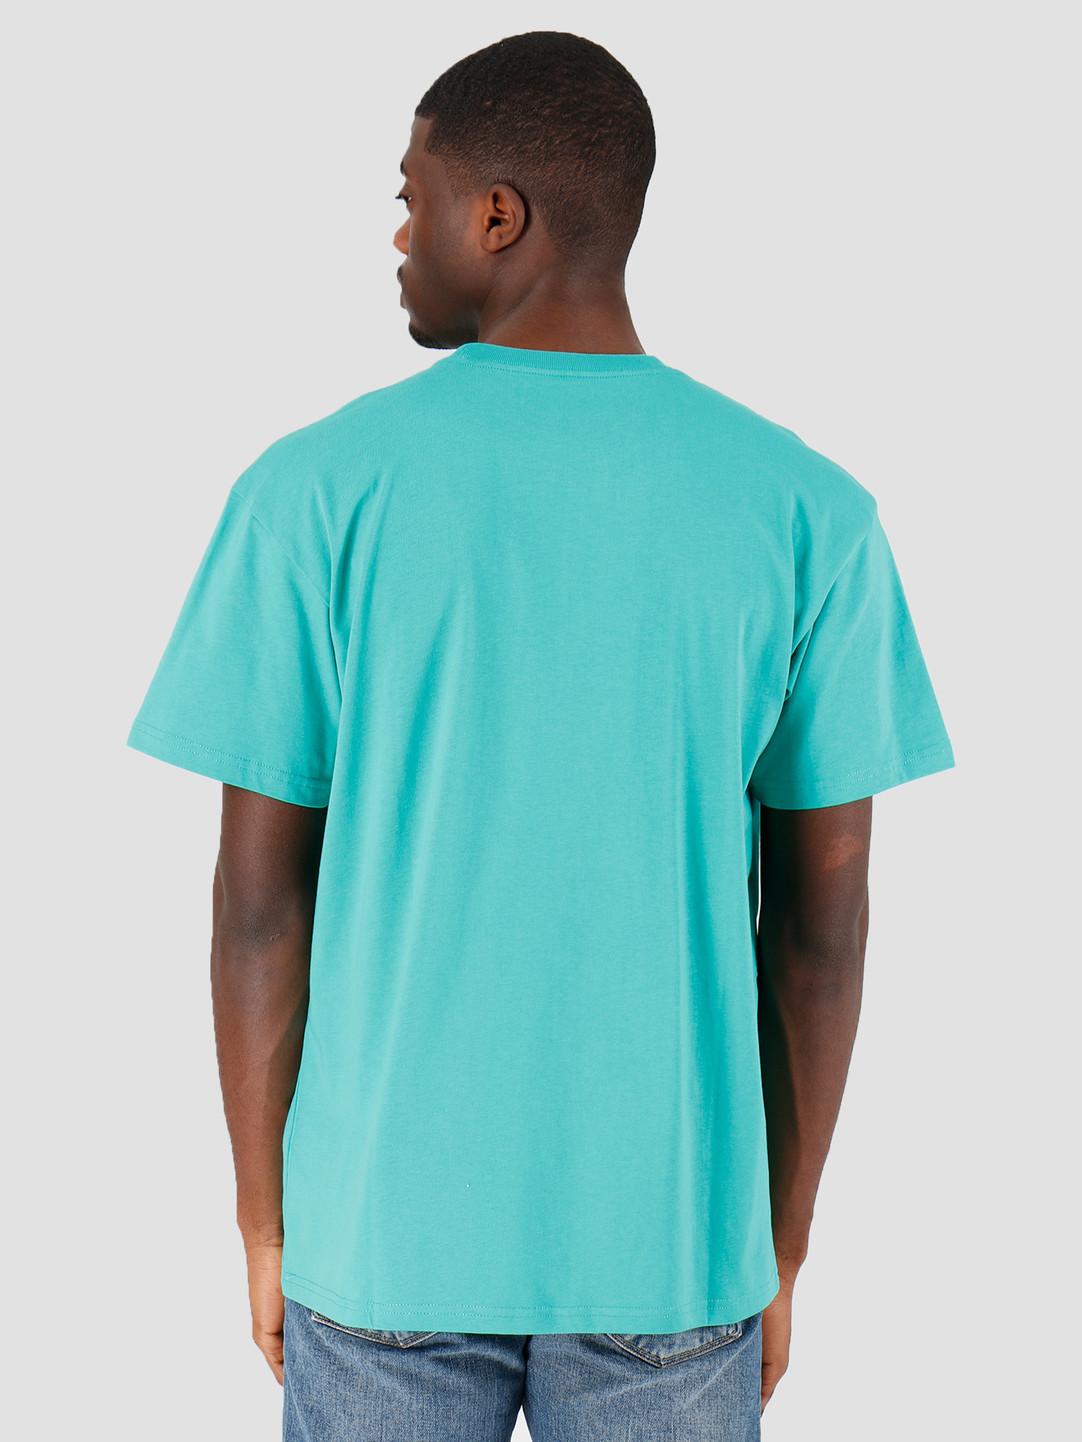 Carhartt WIP Carhartt WIP Chase T-Shirt Yoda Gold I026391-09A90